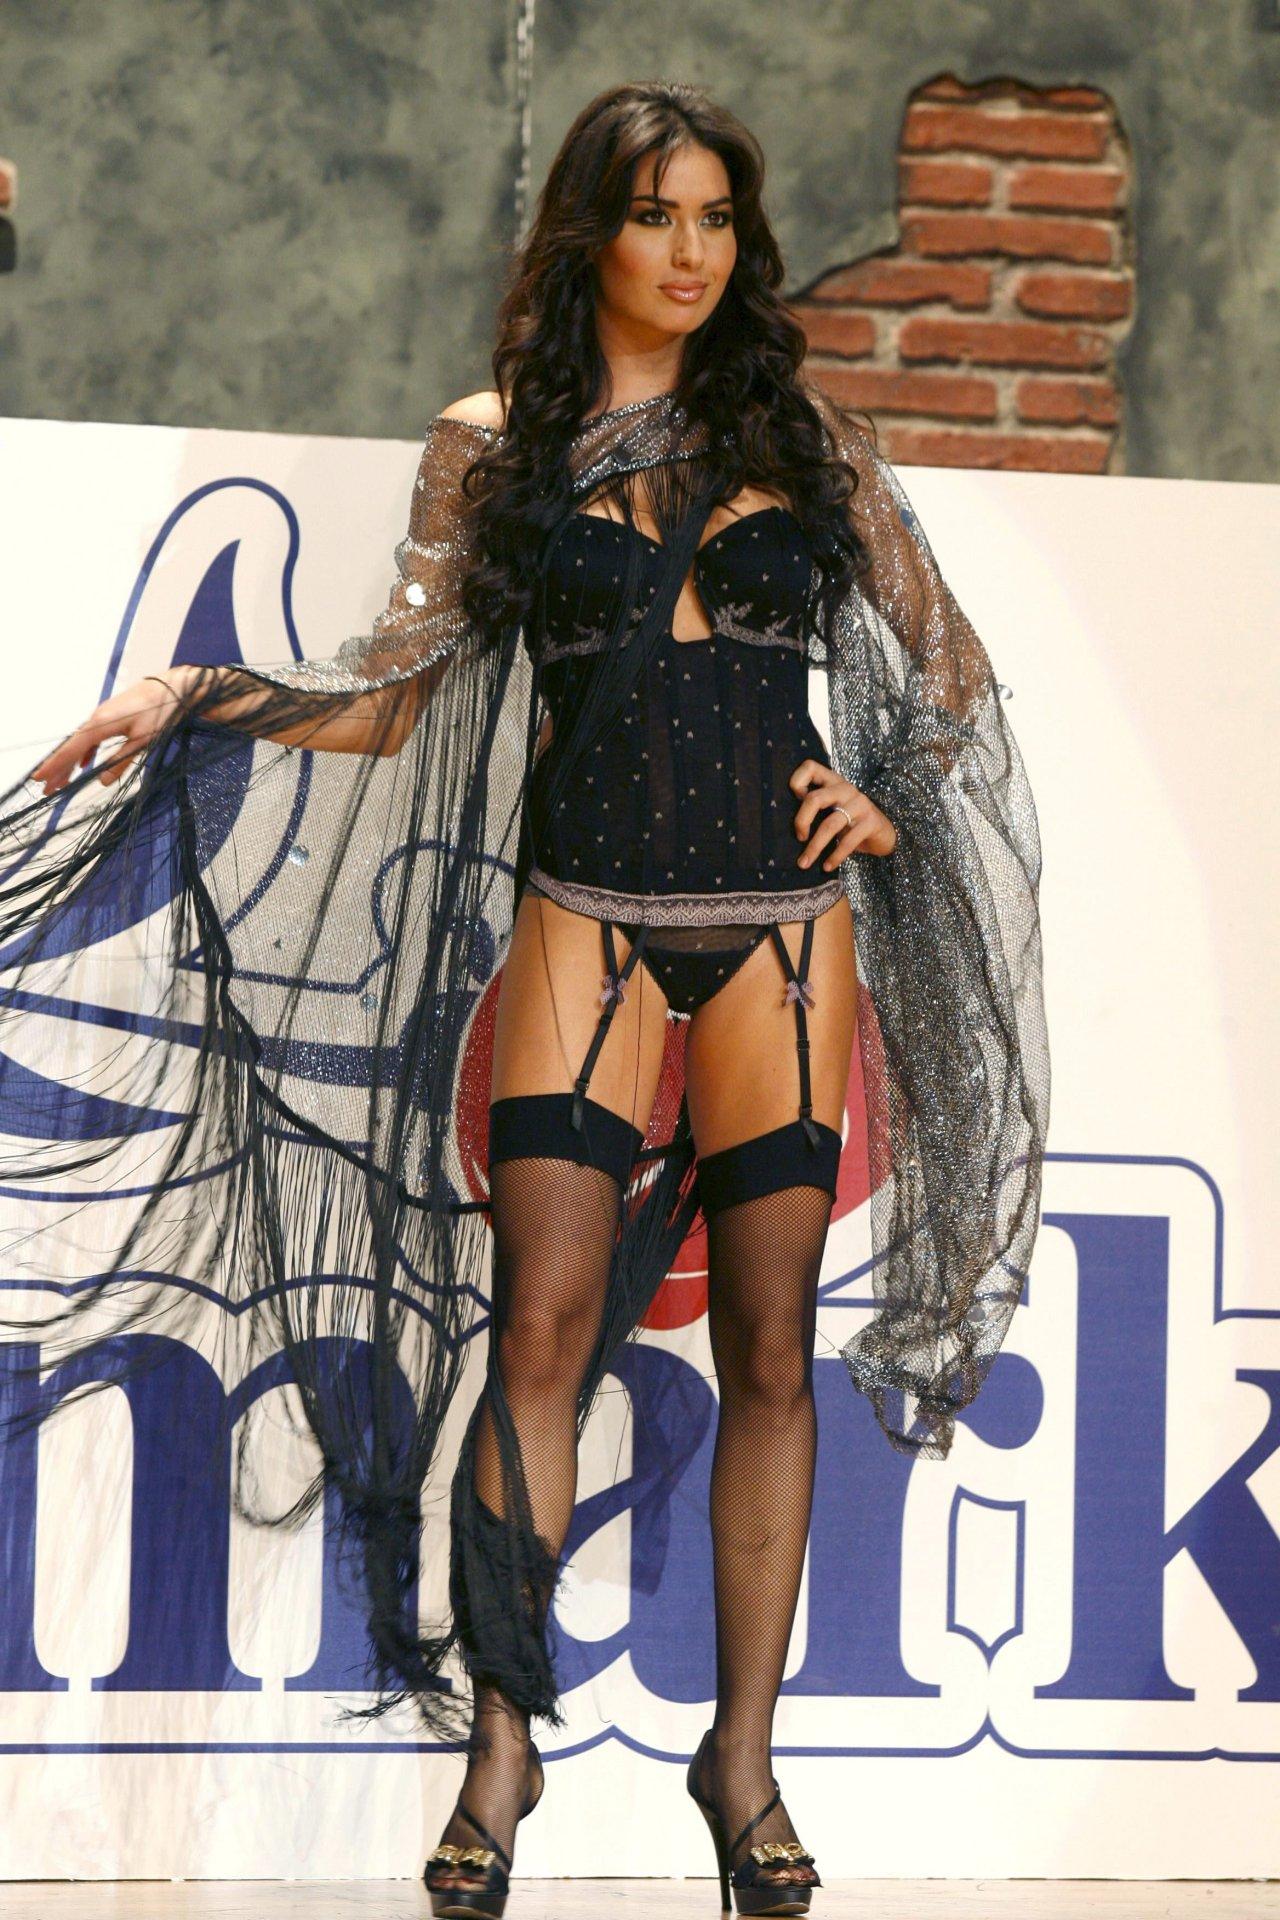 Celebrity Elisabetta Gregoraci Photos Pictures